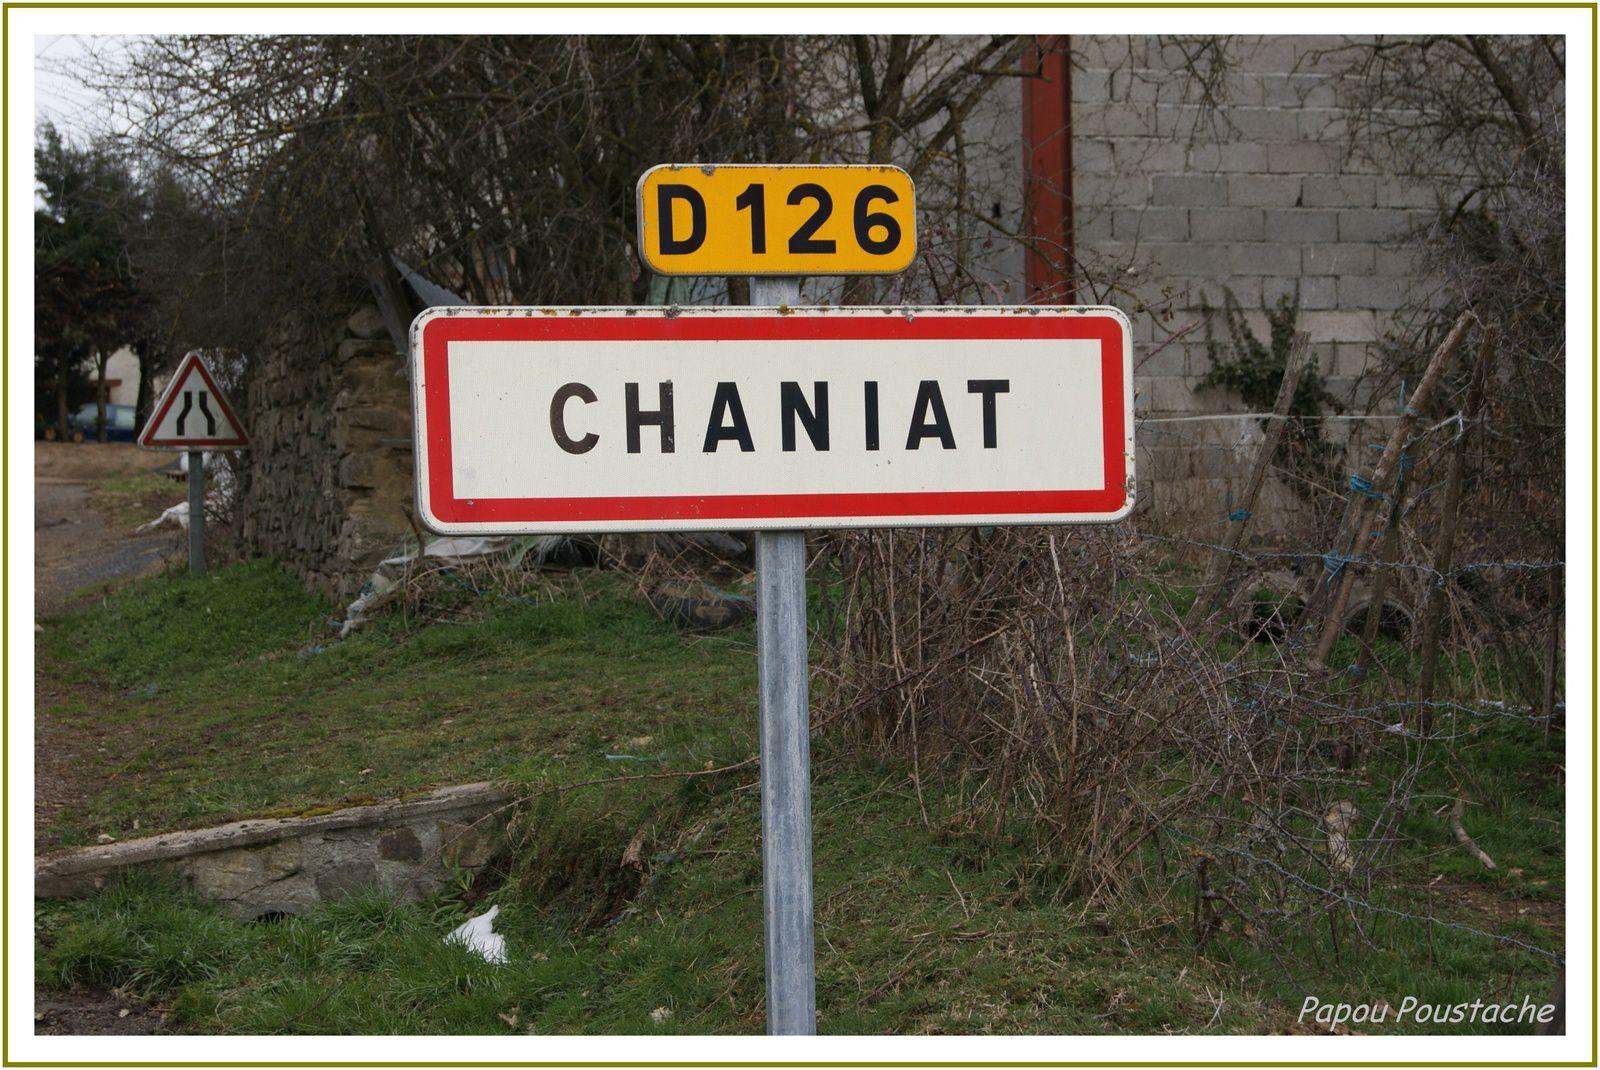 Chaniat